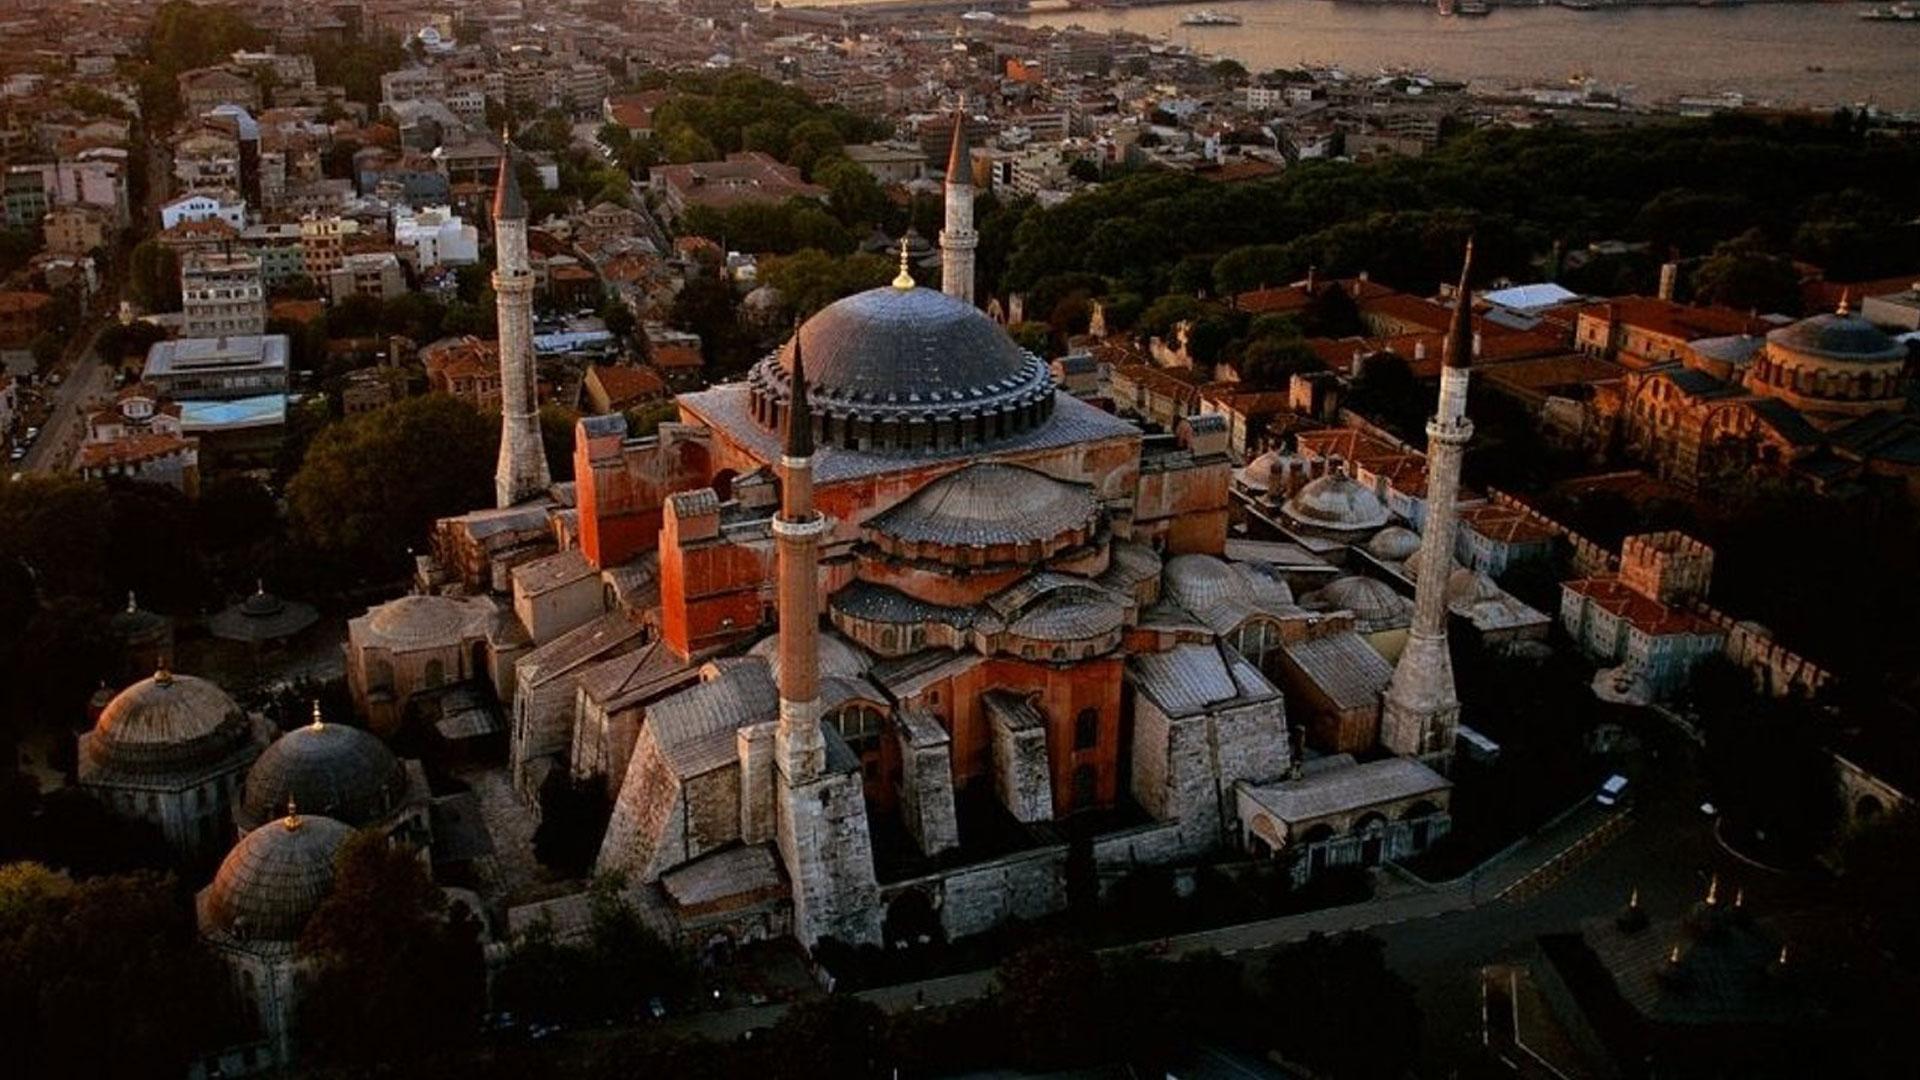 wallpaper-Hagia-sophia-is-a-unique-Turkey-Wallpapers